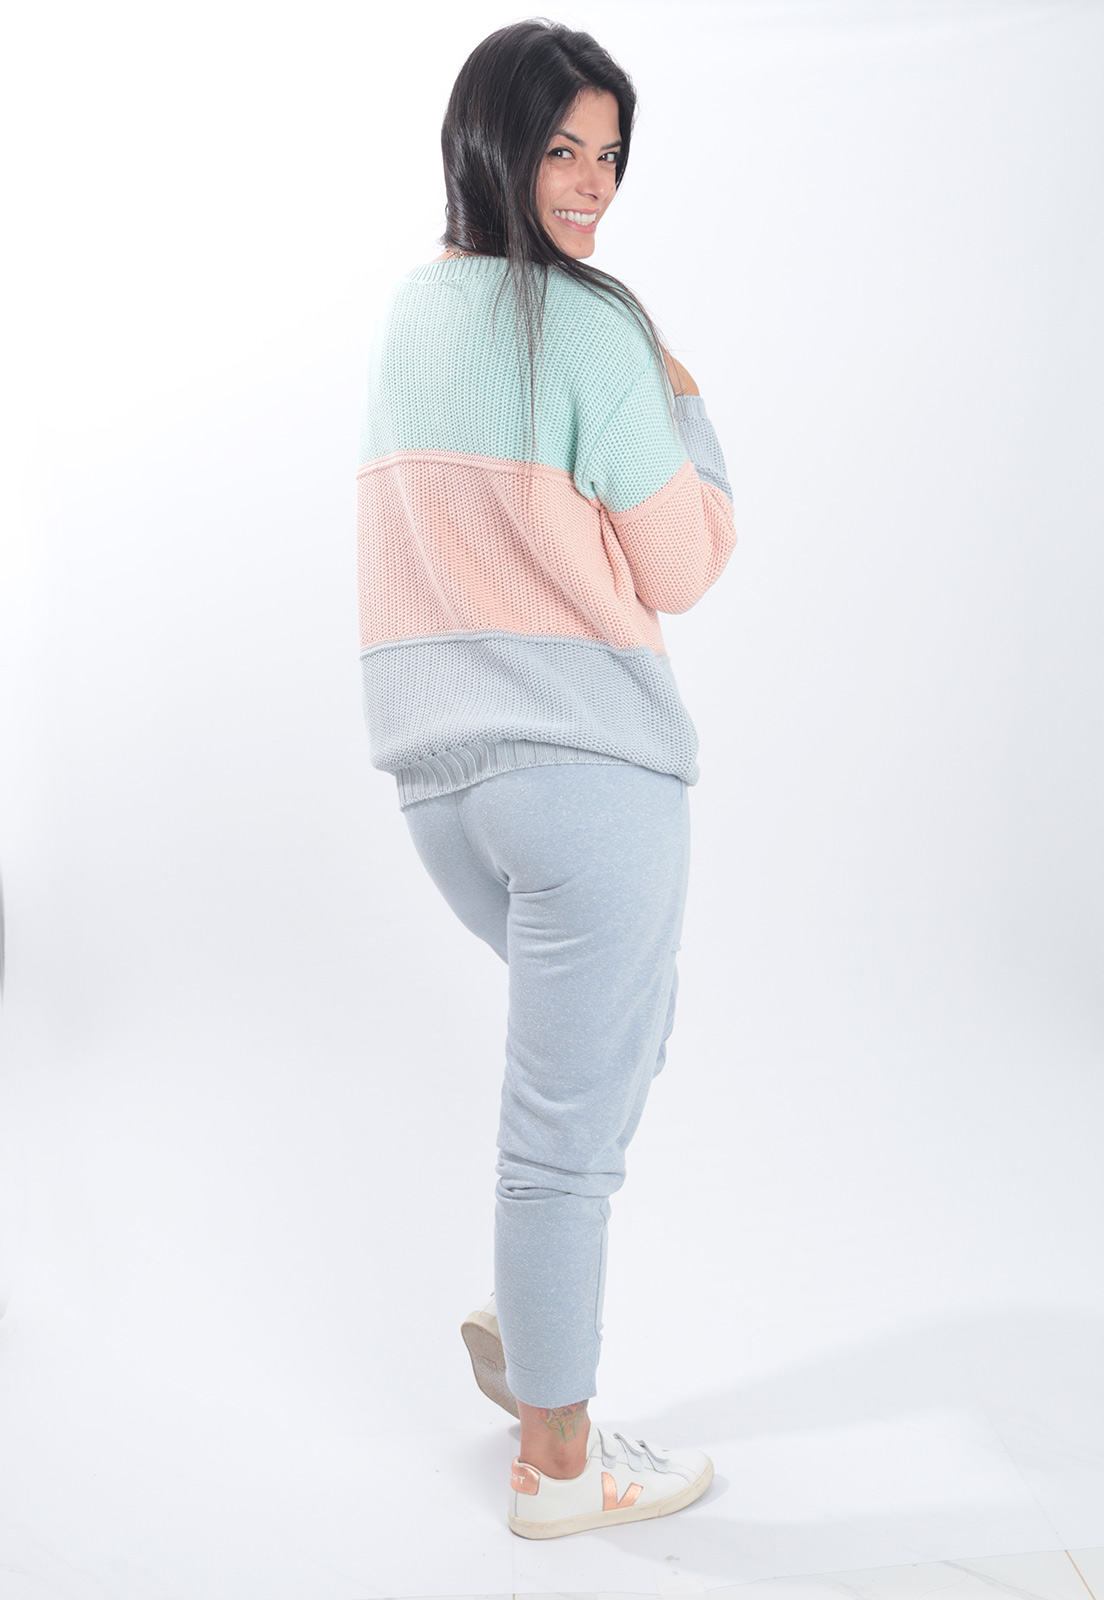 Blusa Stock 3 cores